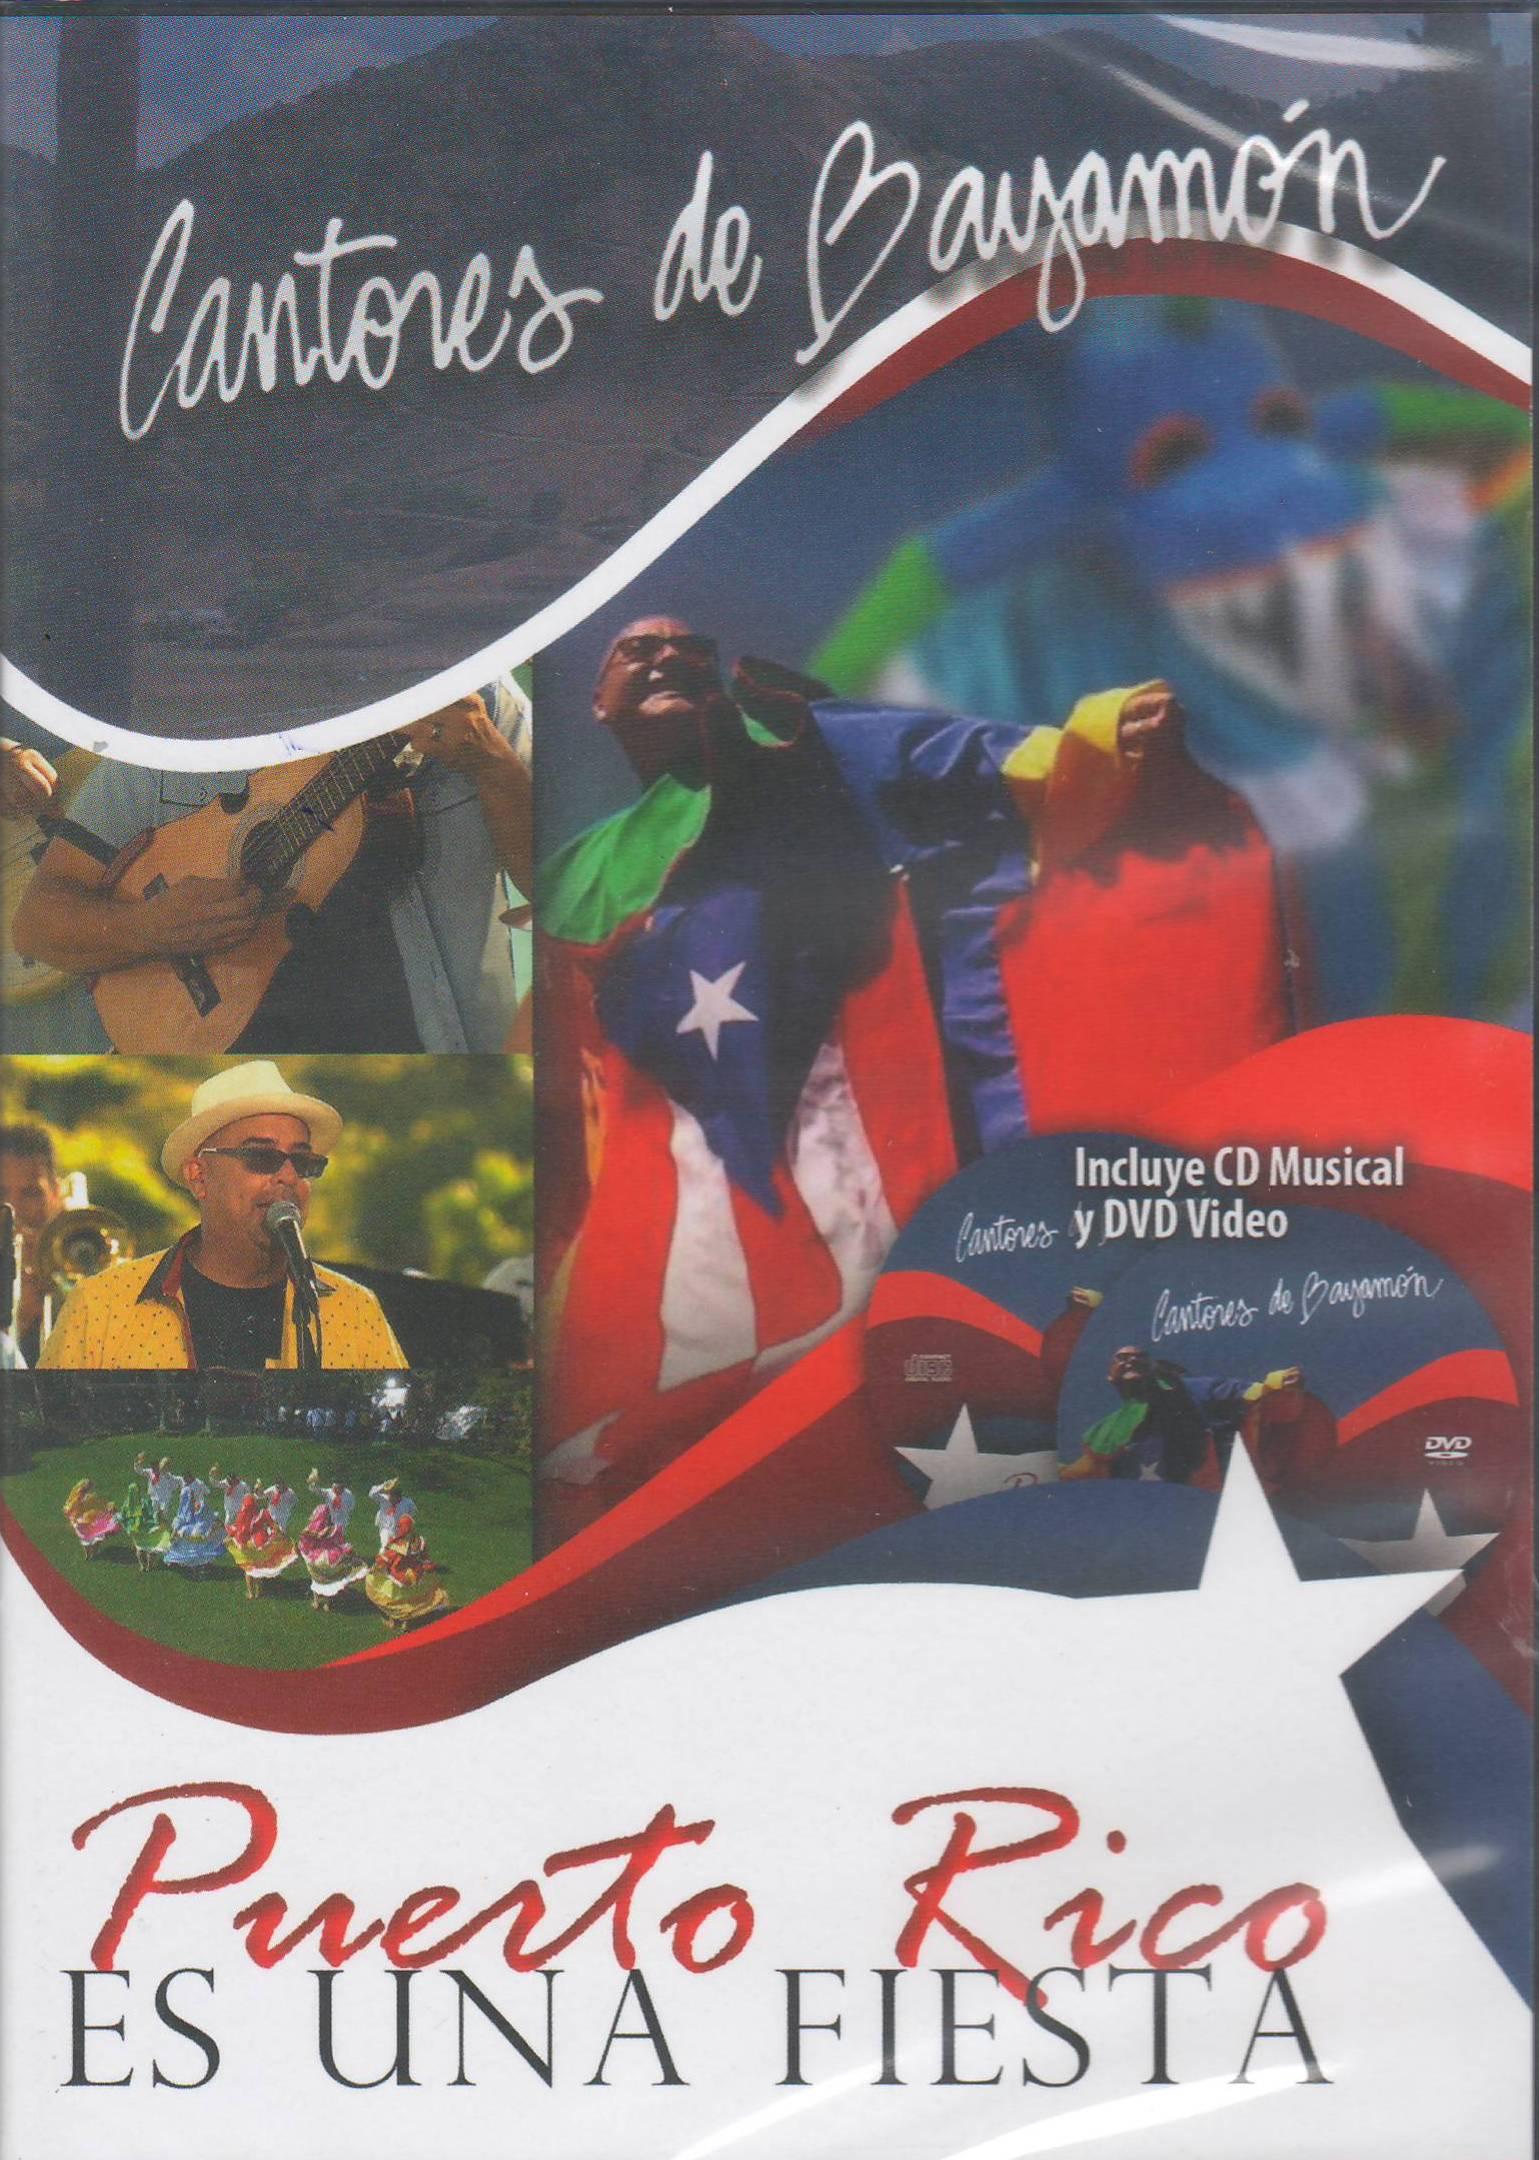 Carátula del cd/dvd de Cantores de Bayamón para 2016. (archivo Fundación Nacional para la Cultura Popular)